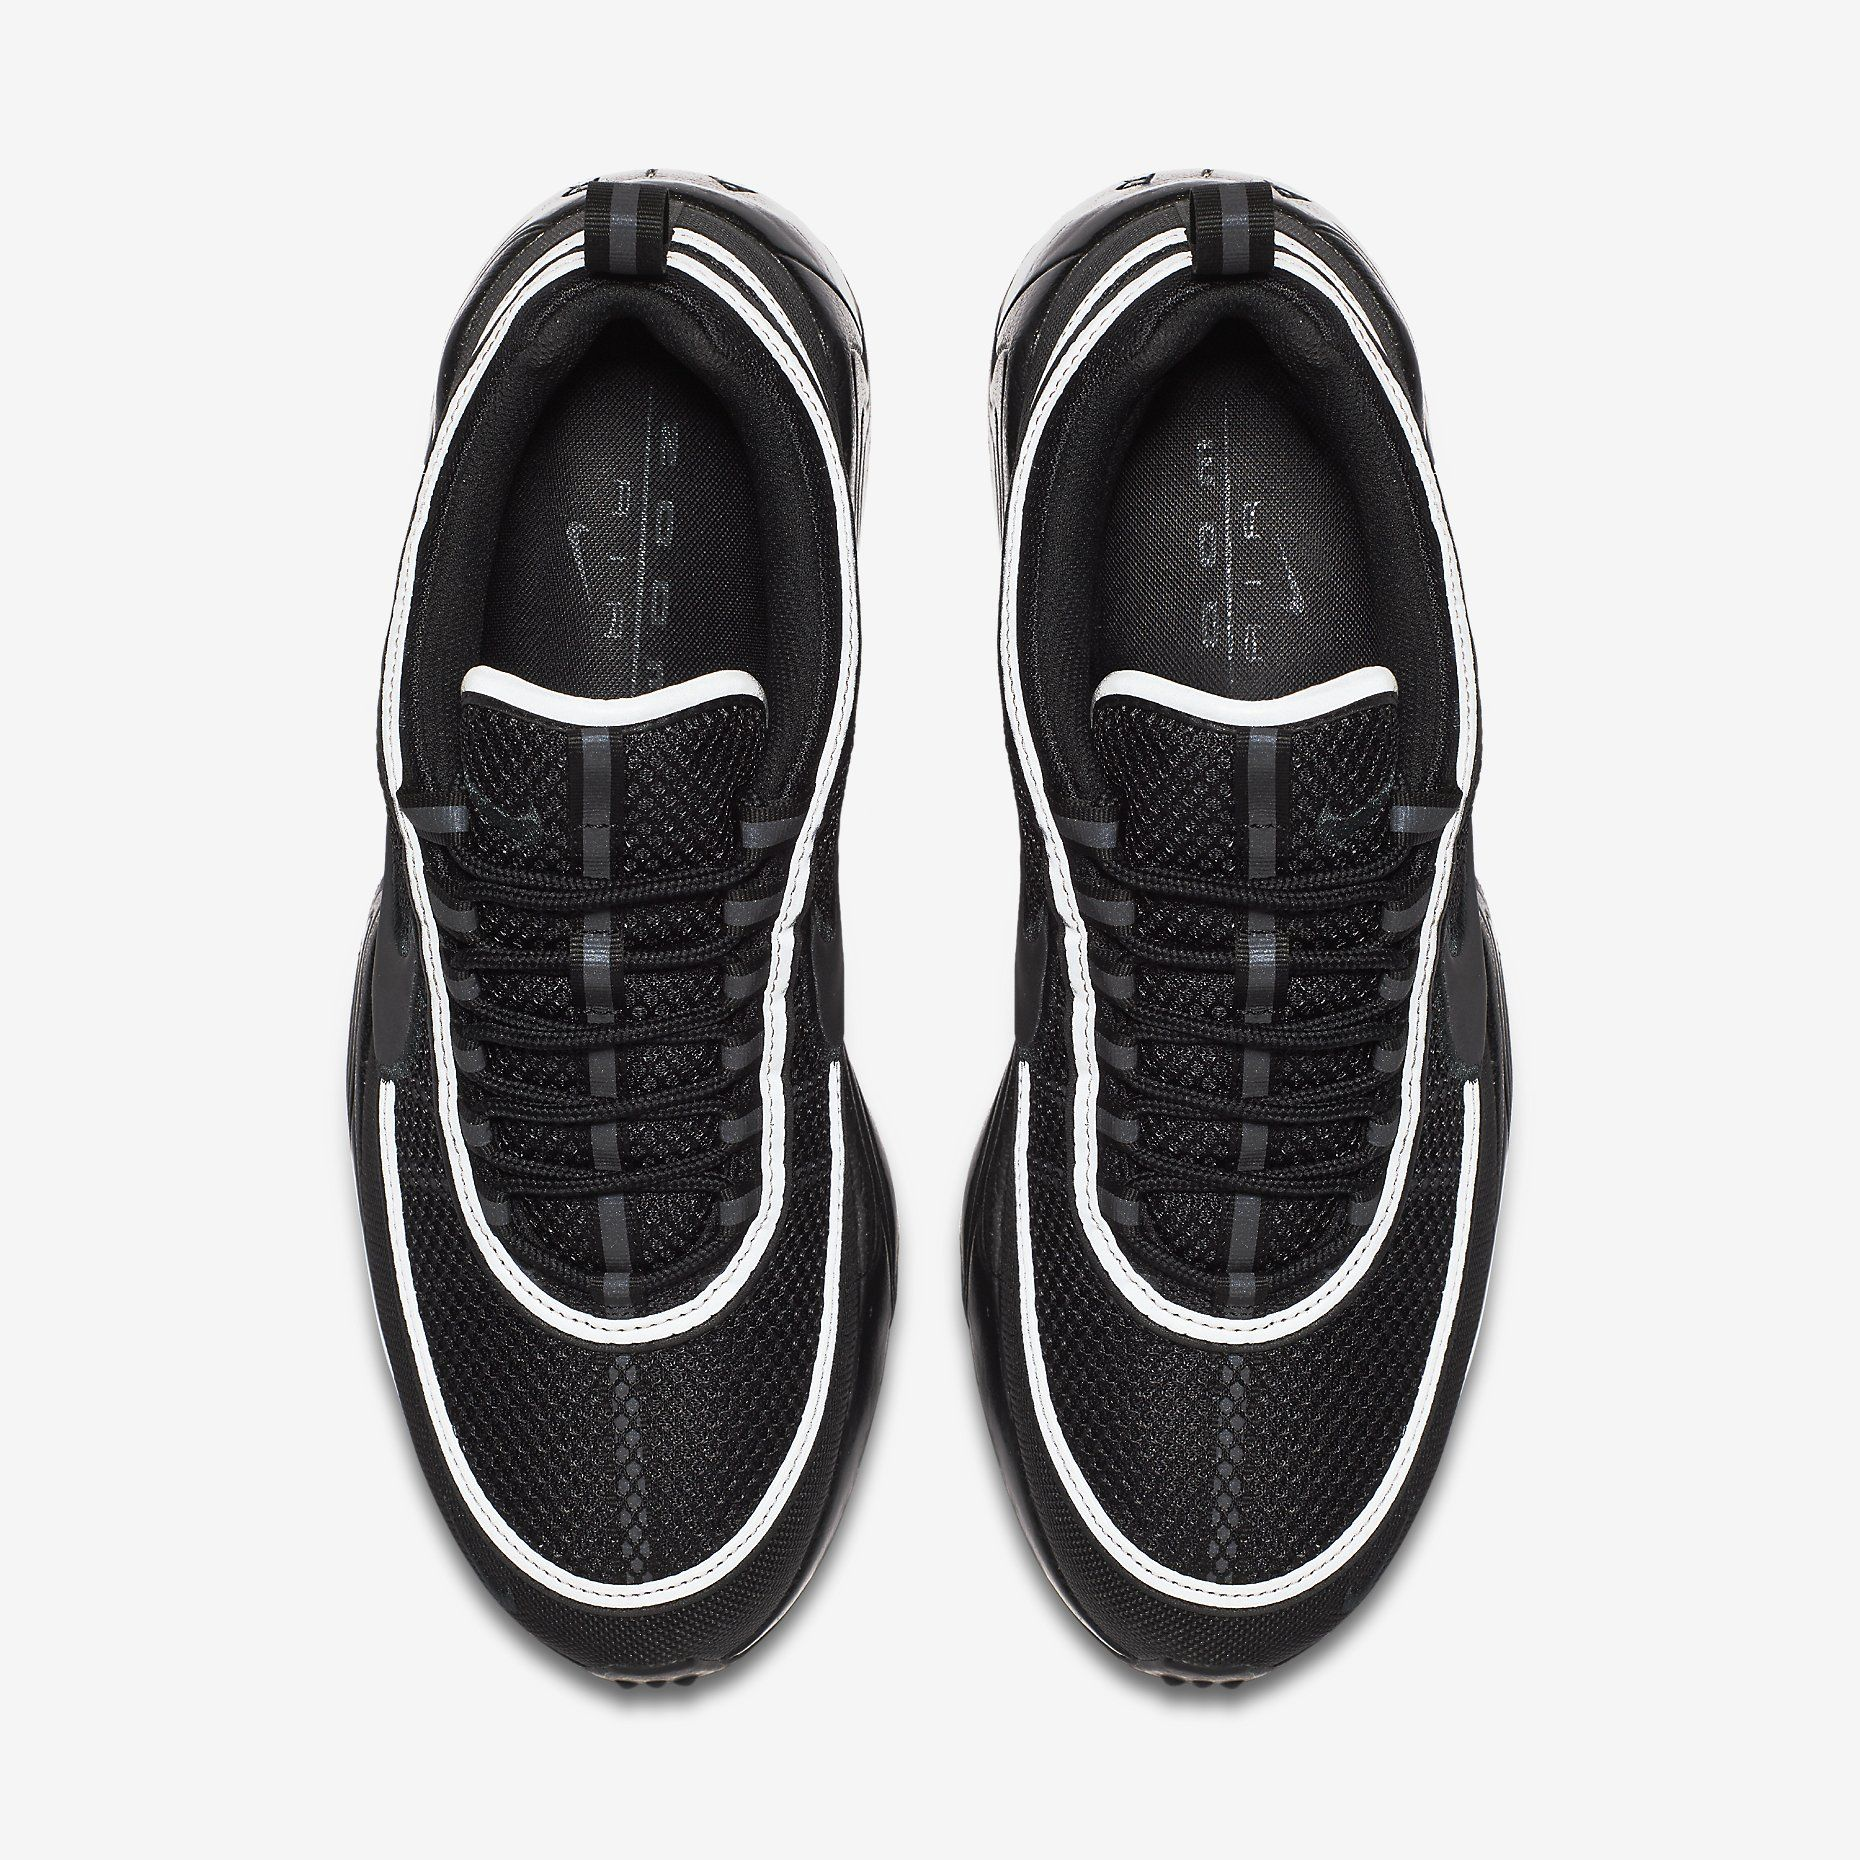 Nike Air Zoom Spiridon Triple Black : Déjà Disponible